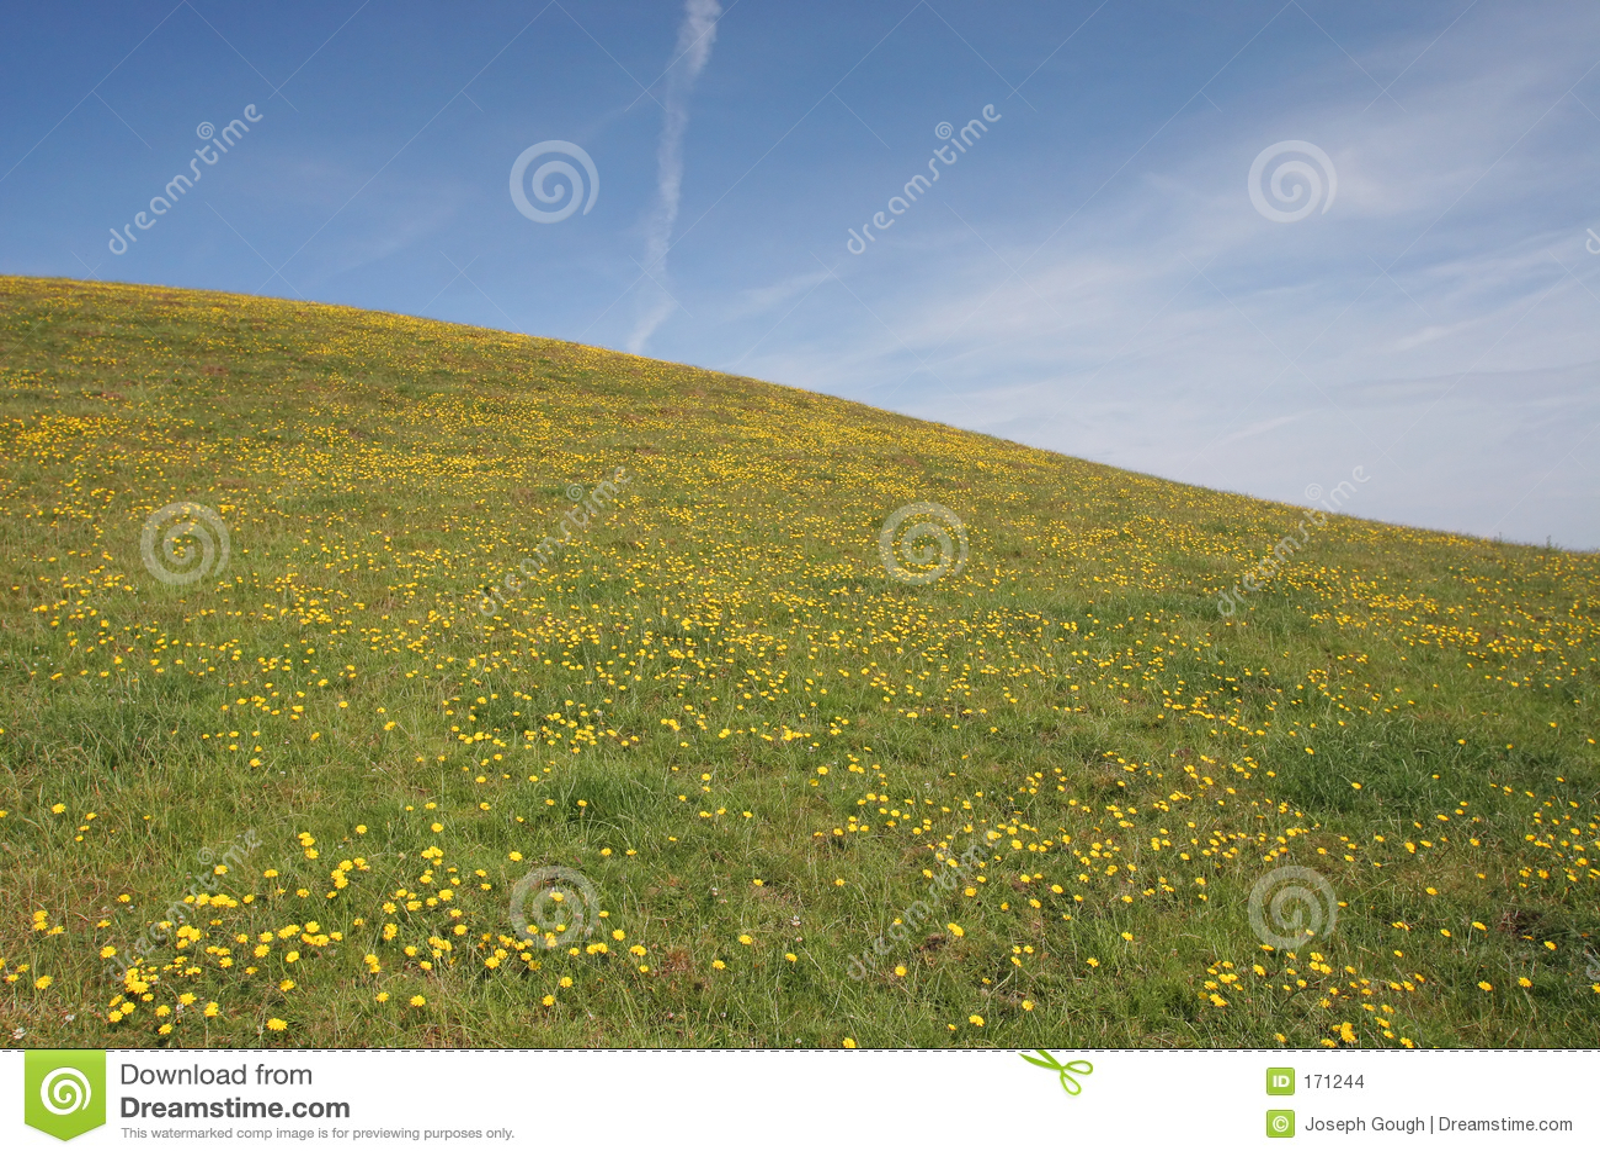 Dandelion Hill